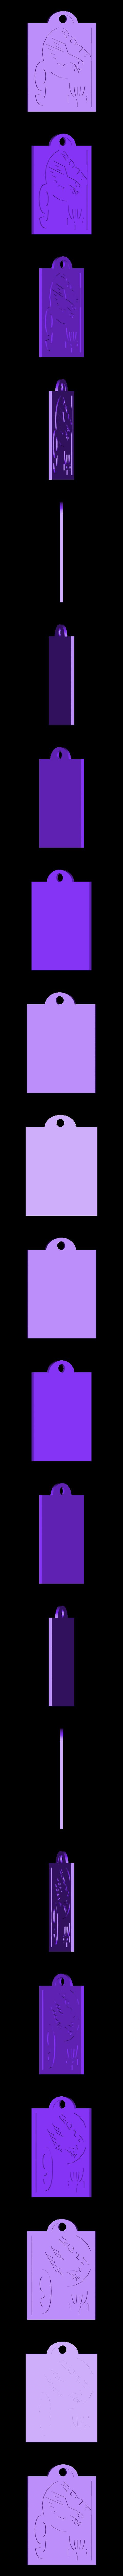 Disc_Bag_Tag_9.stl Download free STL file Disc Golf Bag Tag • 3D print design, mrhers2